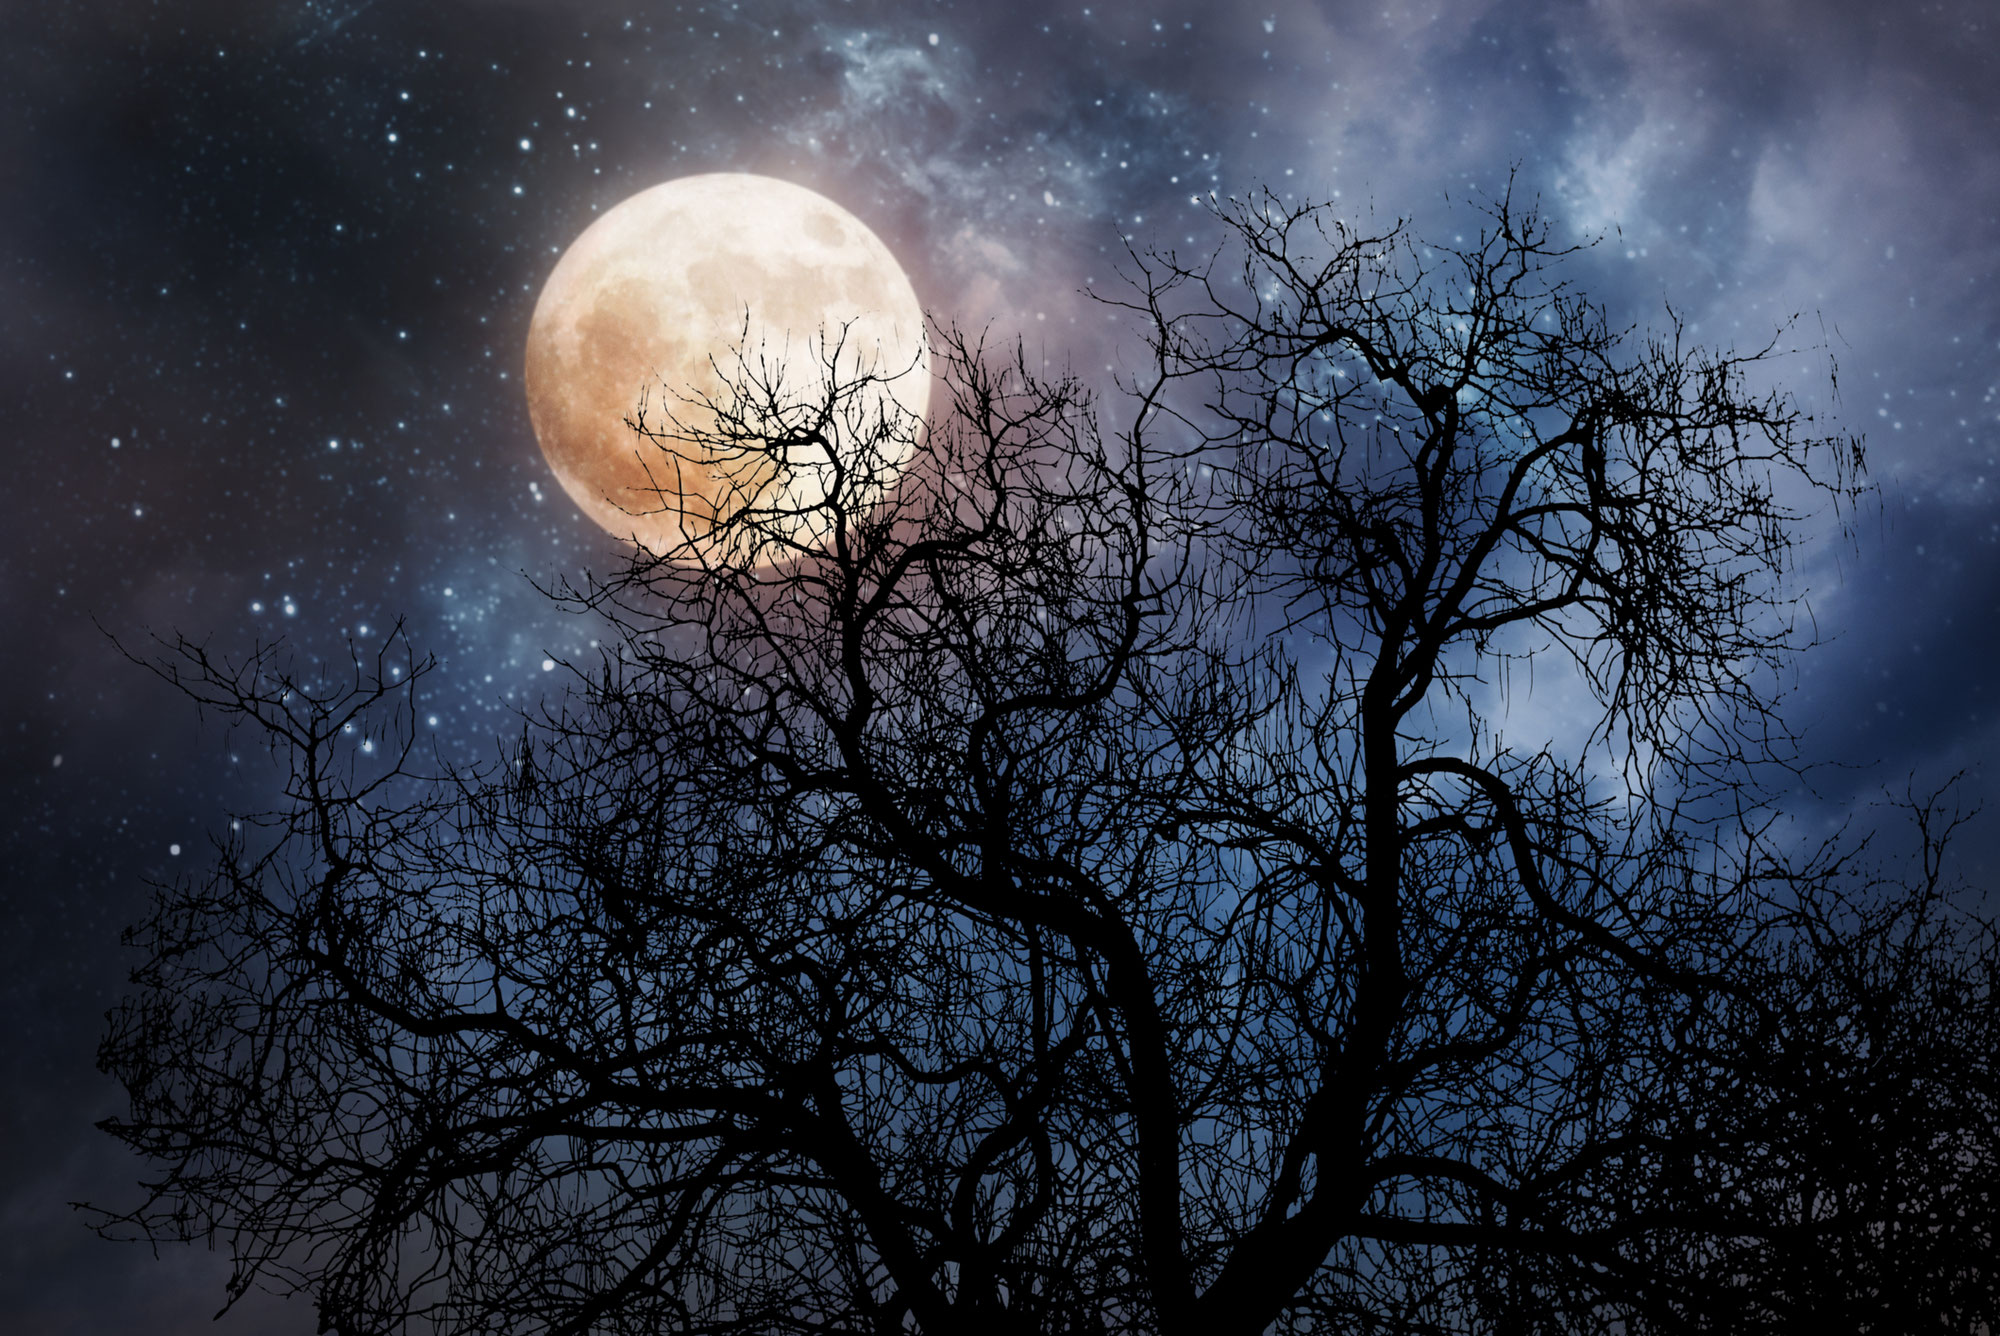 Volle Maan 20 oktober 2021 ♥ Petra Stam ♥ Lichtwerkers Nederland